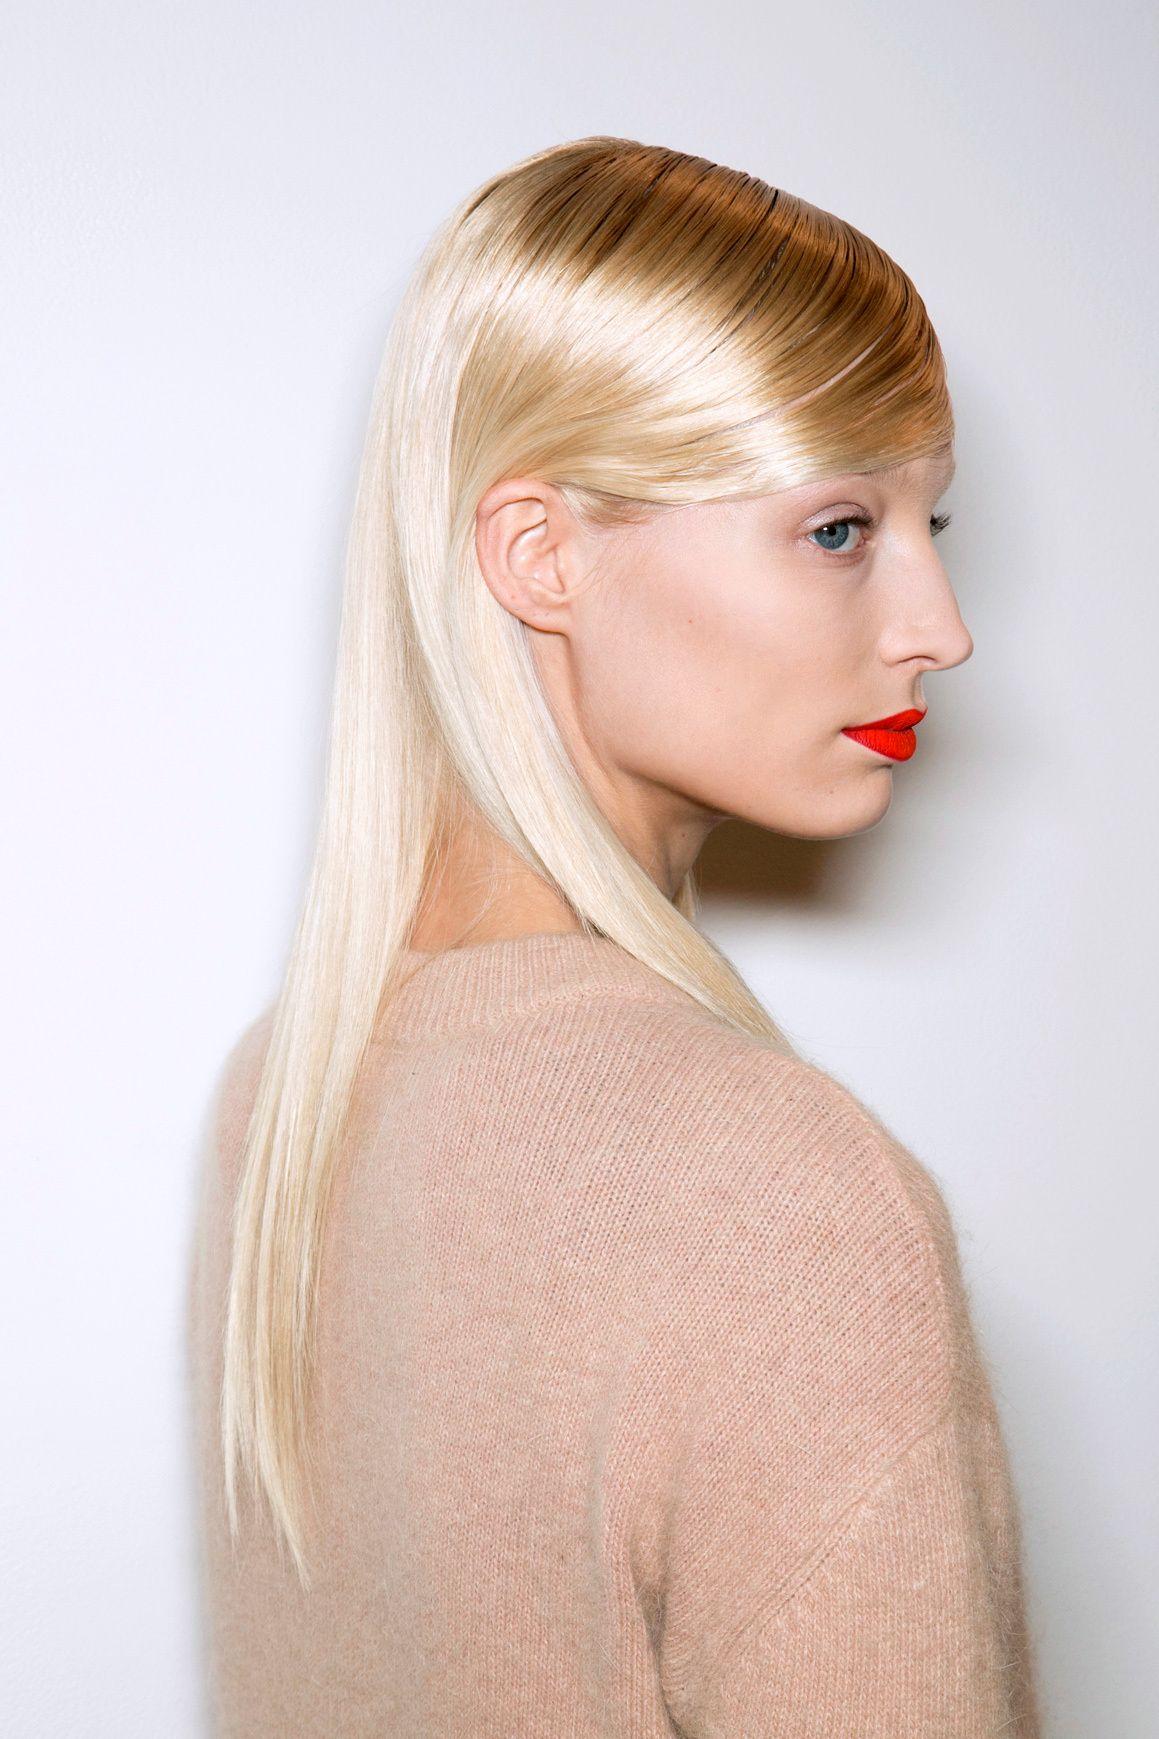 Ask an Expert How Can I Keep My Bleach Blonde Hair